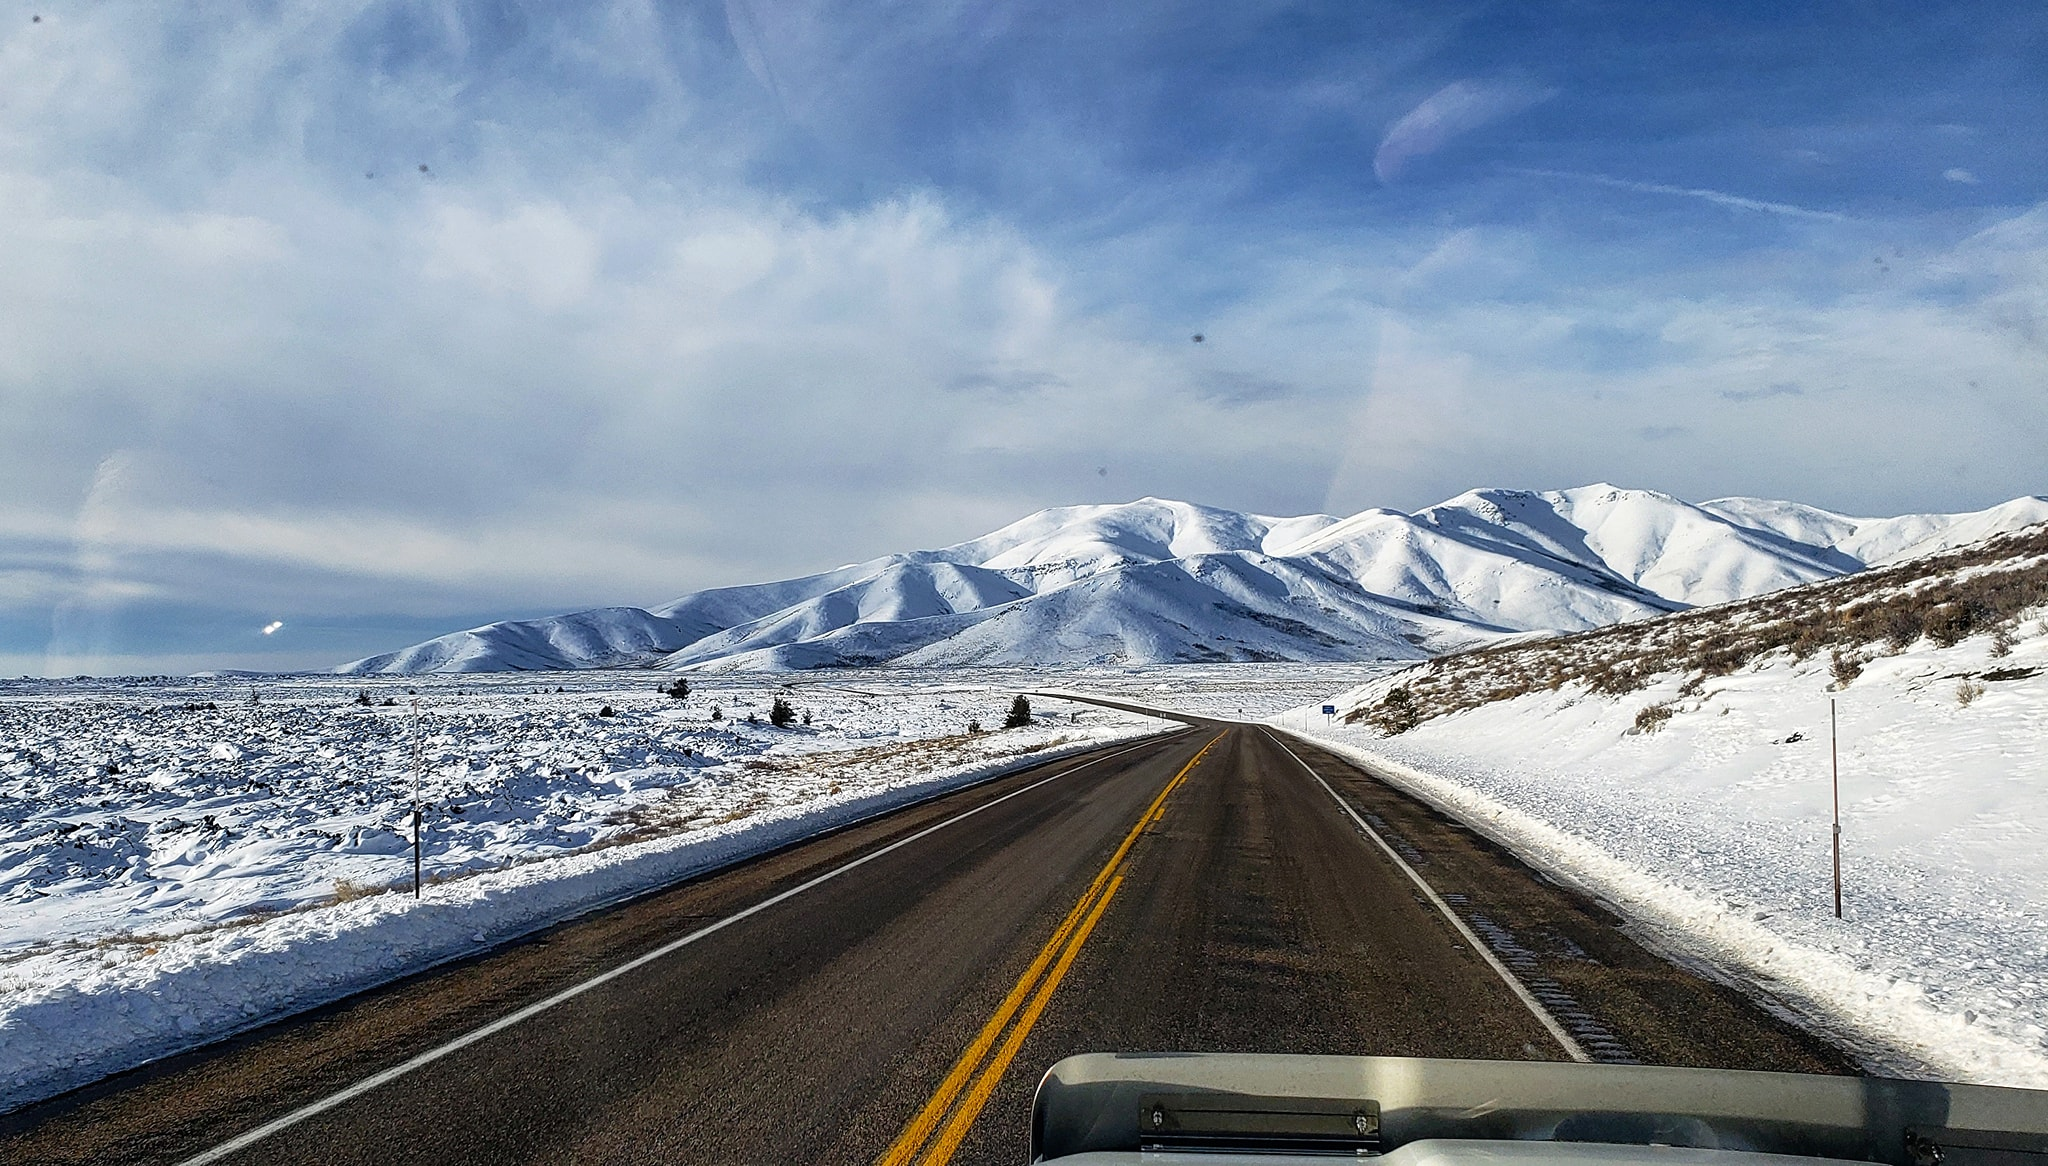 Dirk-Pieter-Verbeek-reis-naar-Idaho-13-1-2019--7